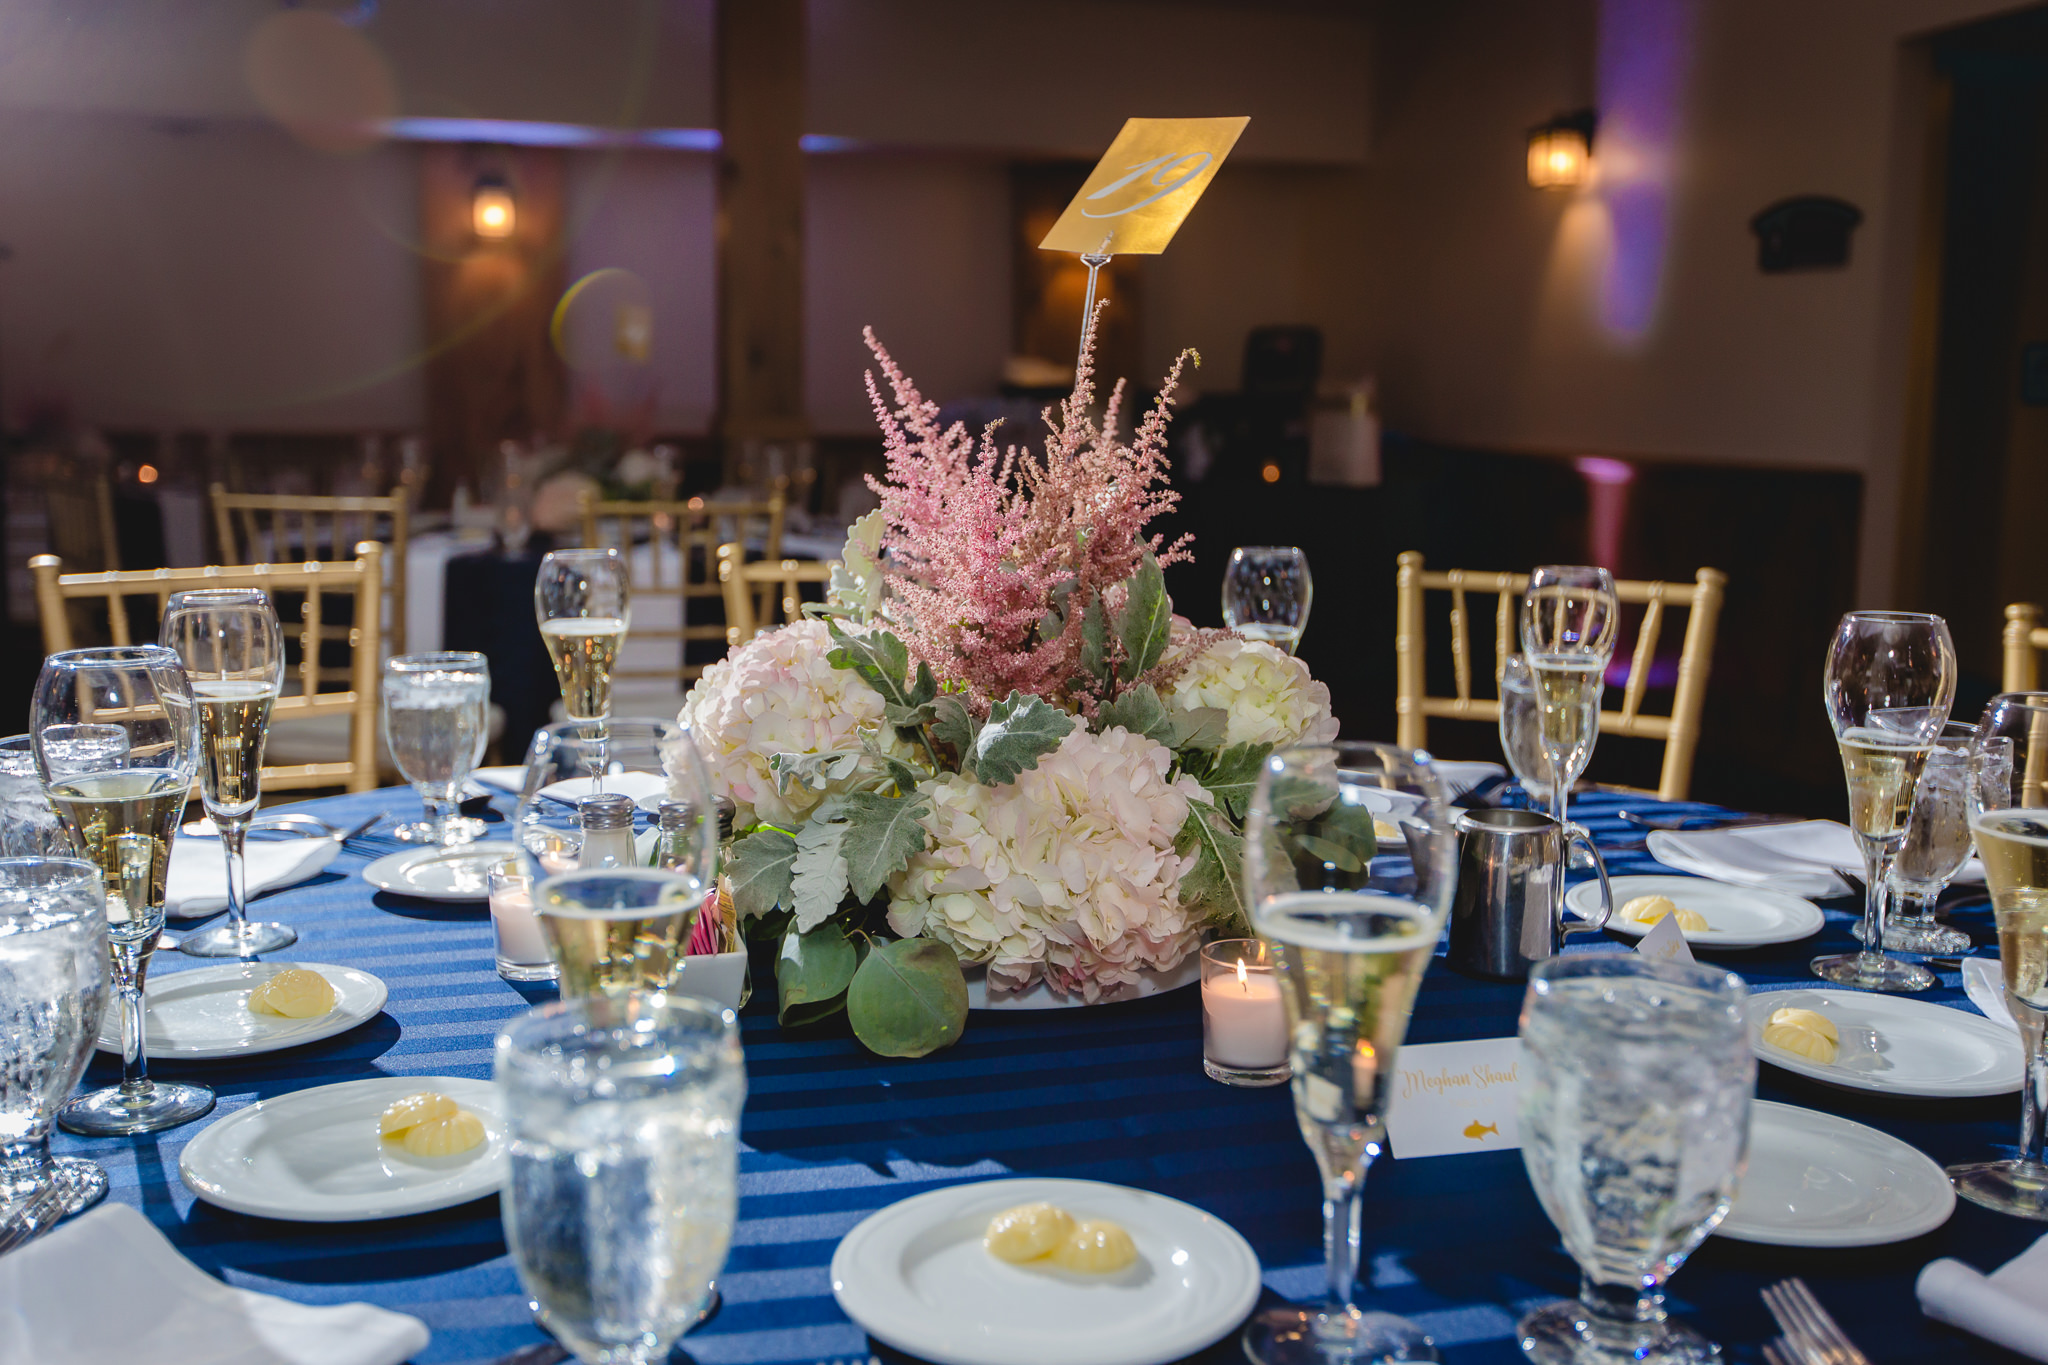 Hydrangea centerpieces at a Hidden Valley Resort wedding reception